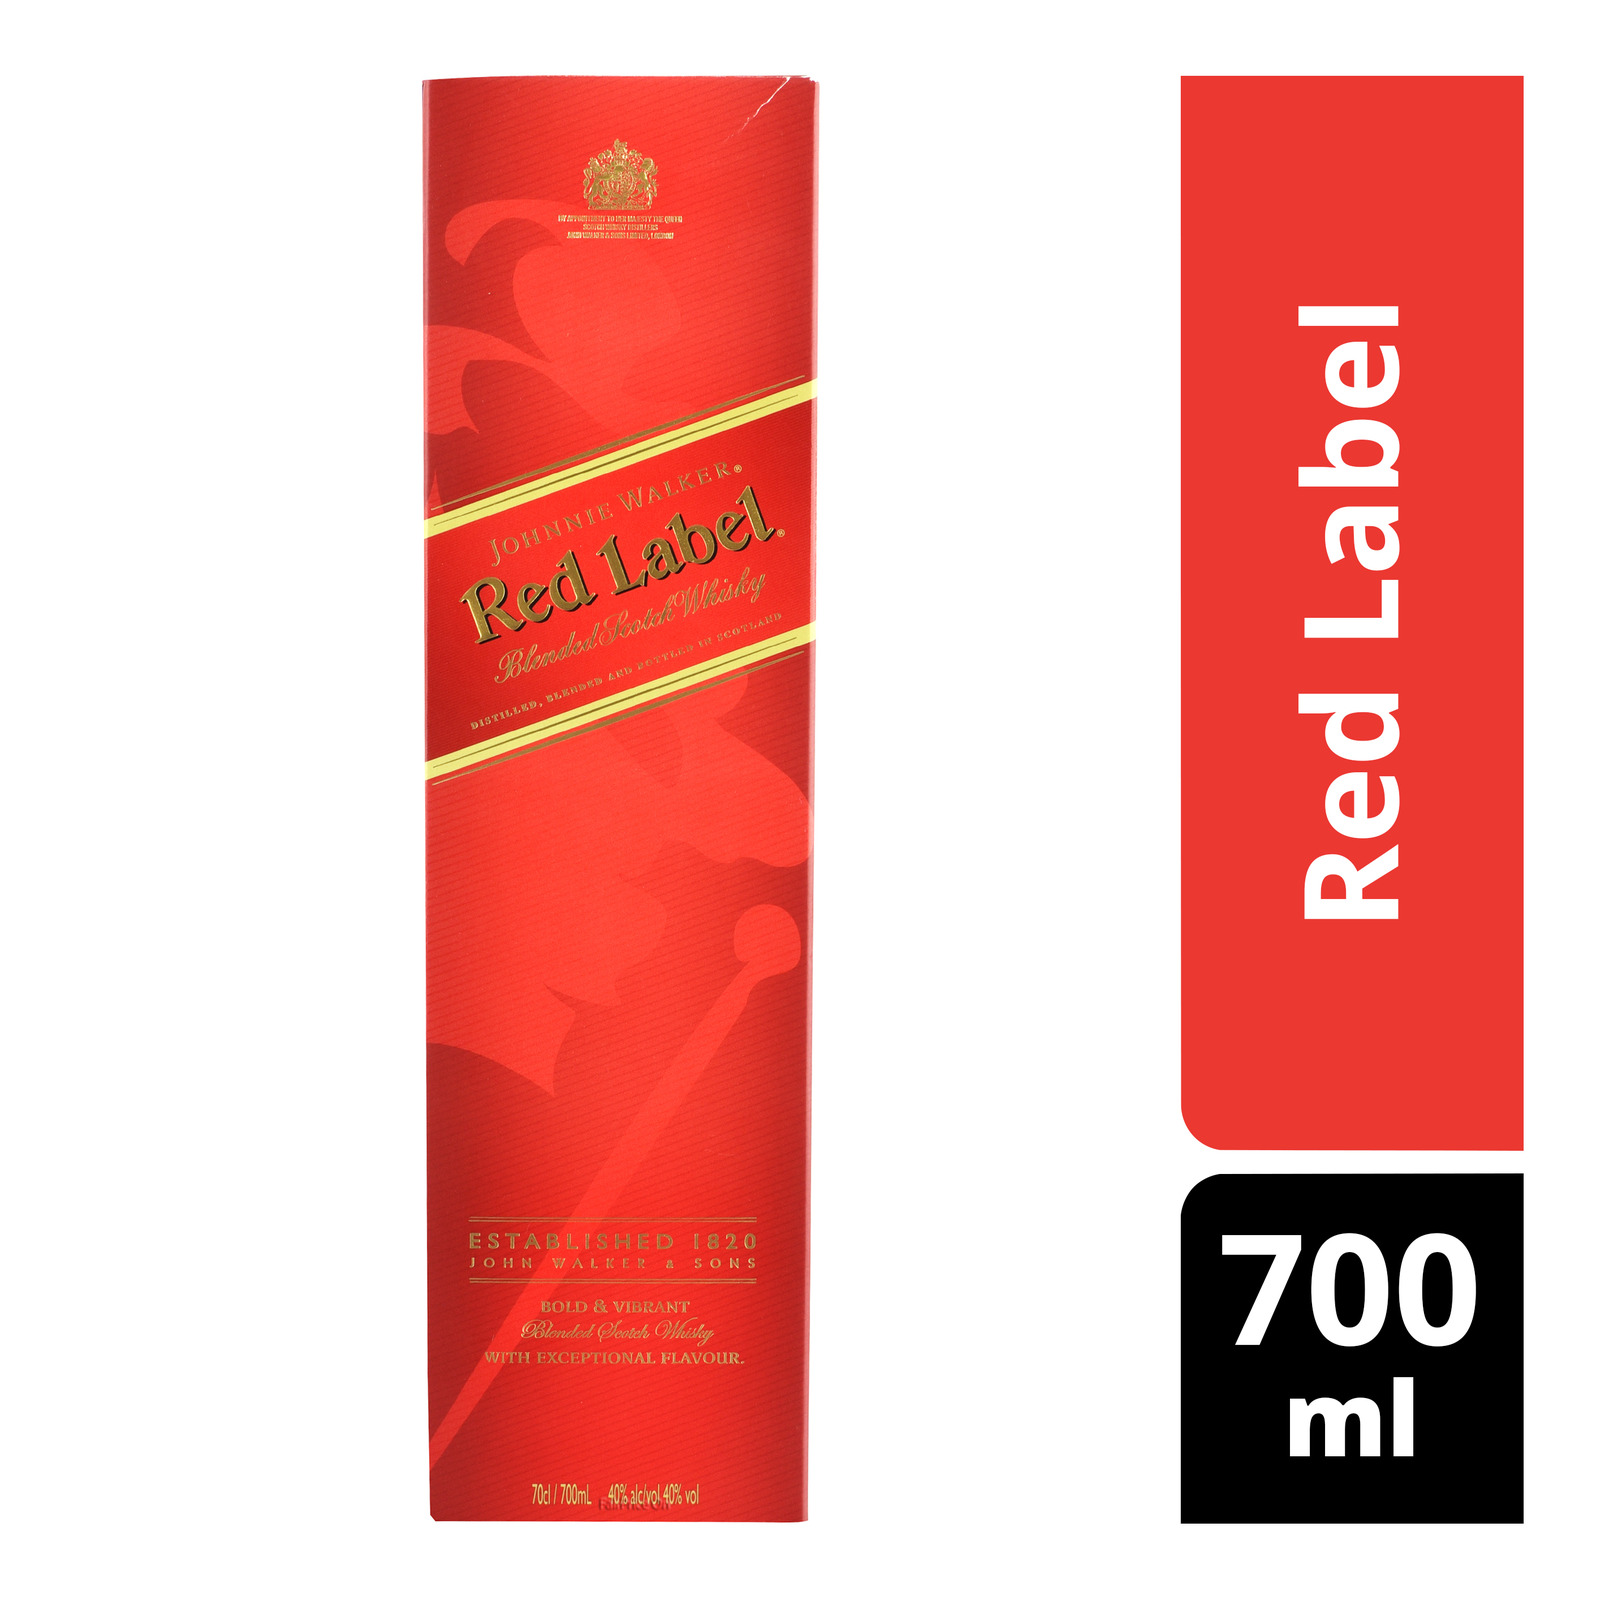 Johnnie Walker Scotch Whisky - Red Label